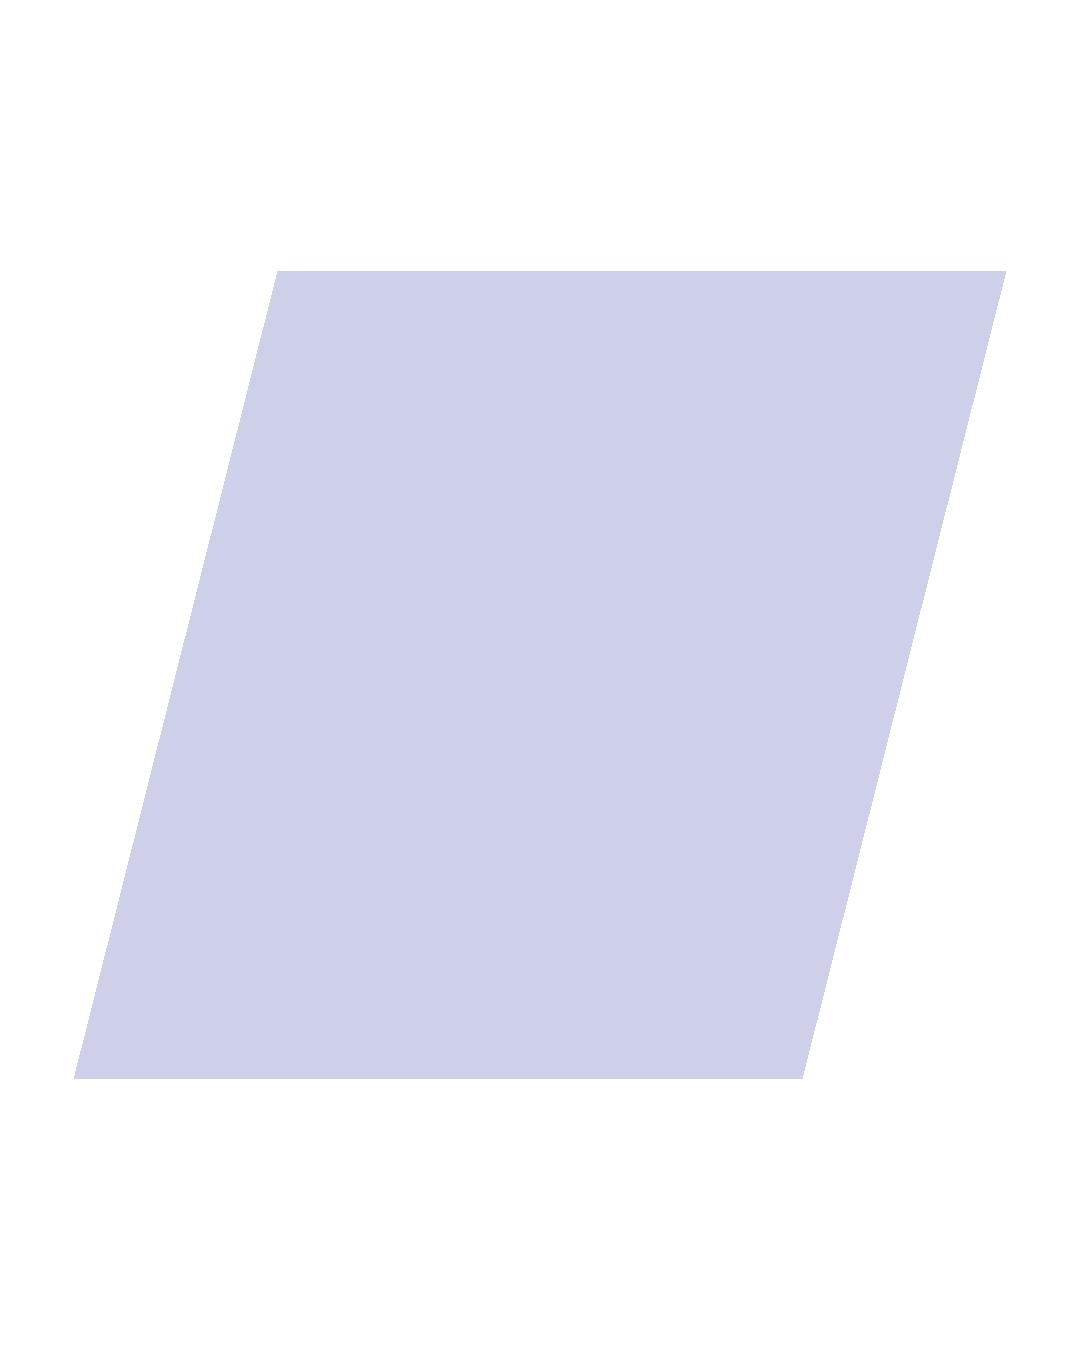 Standby colour